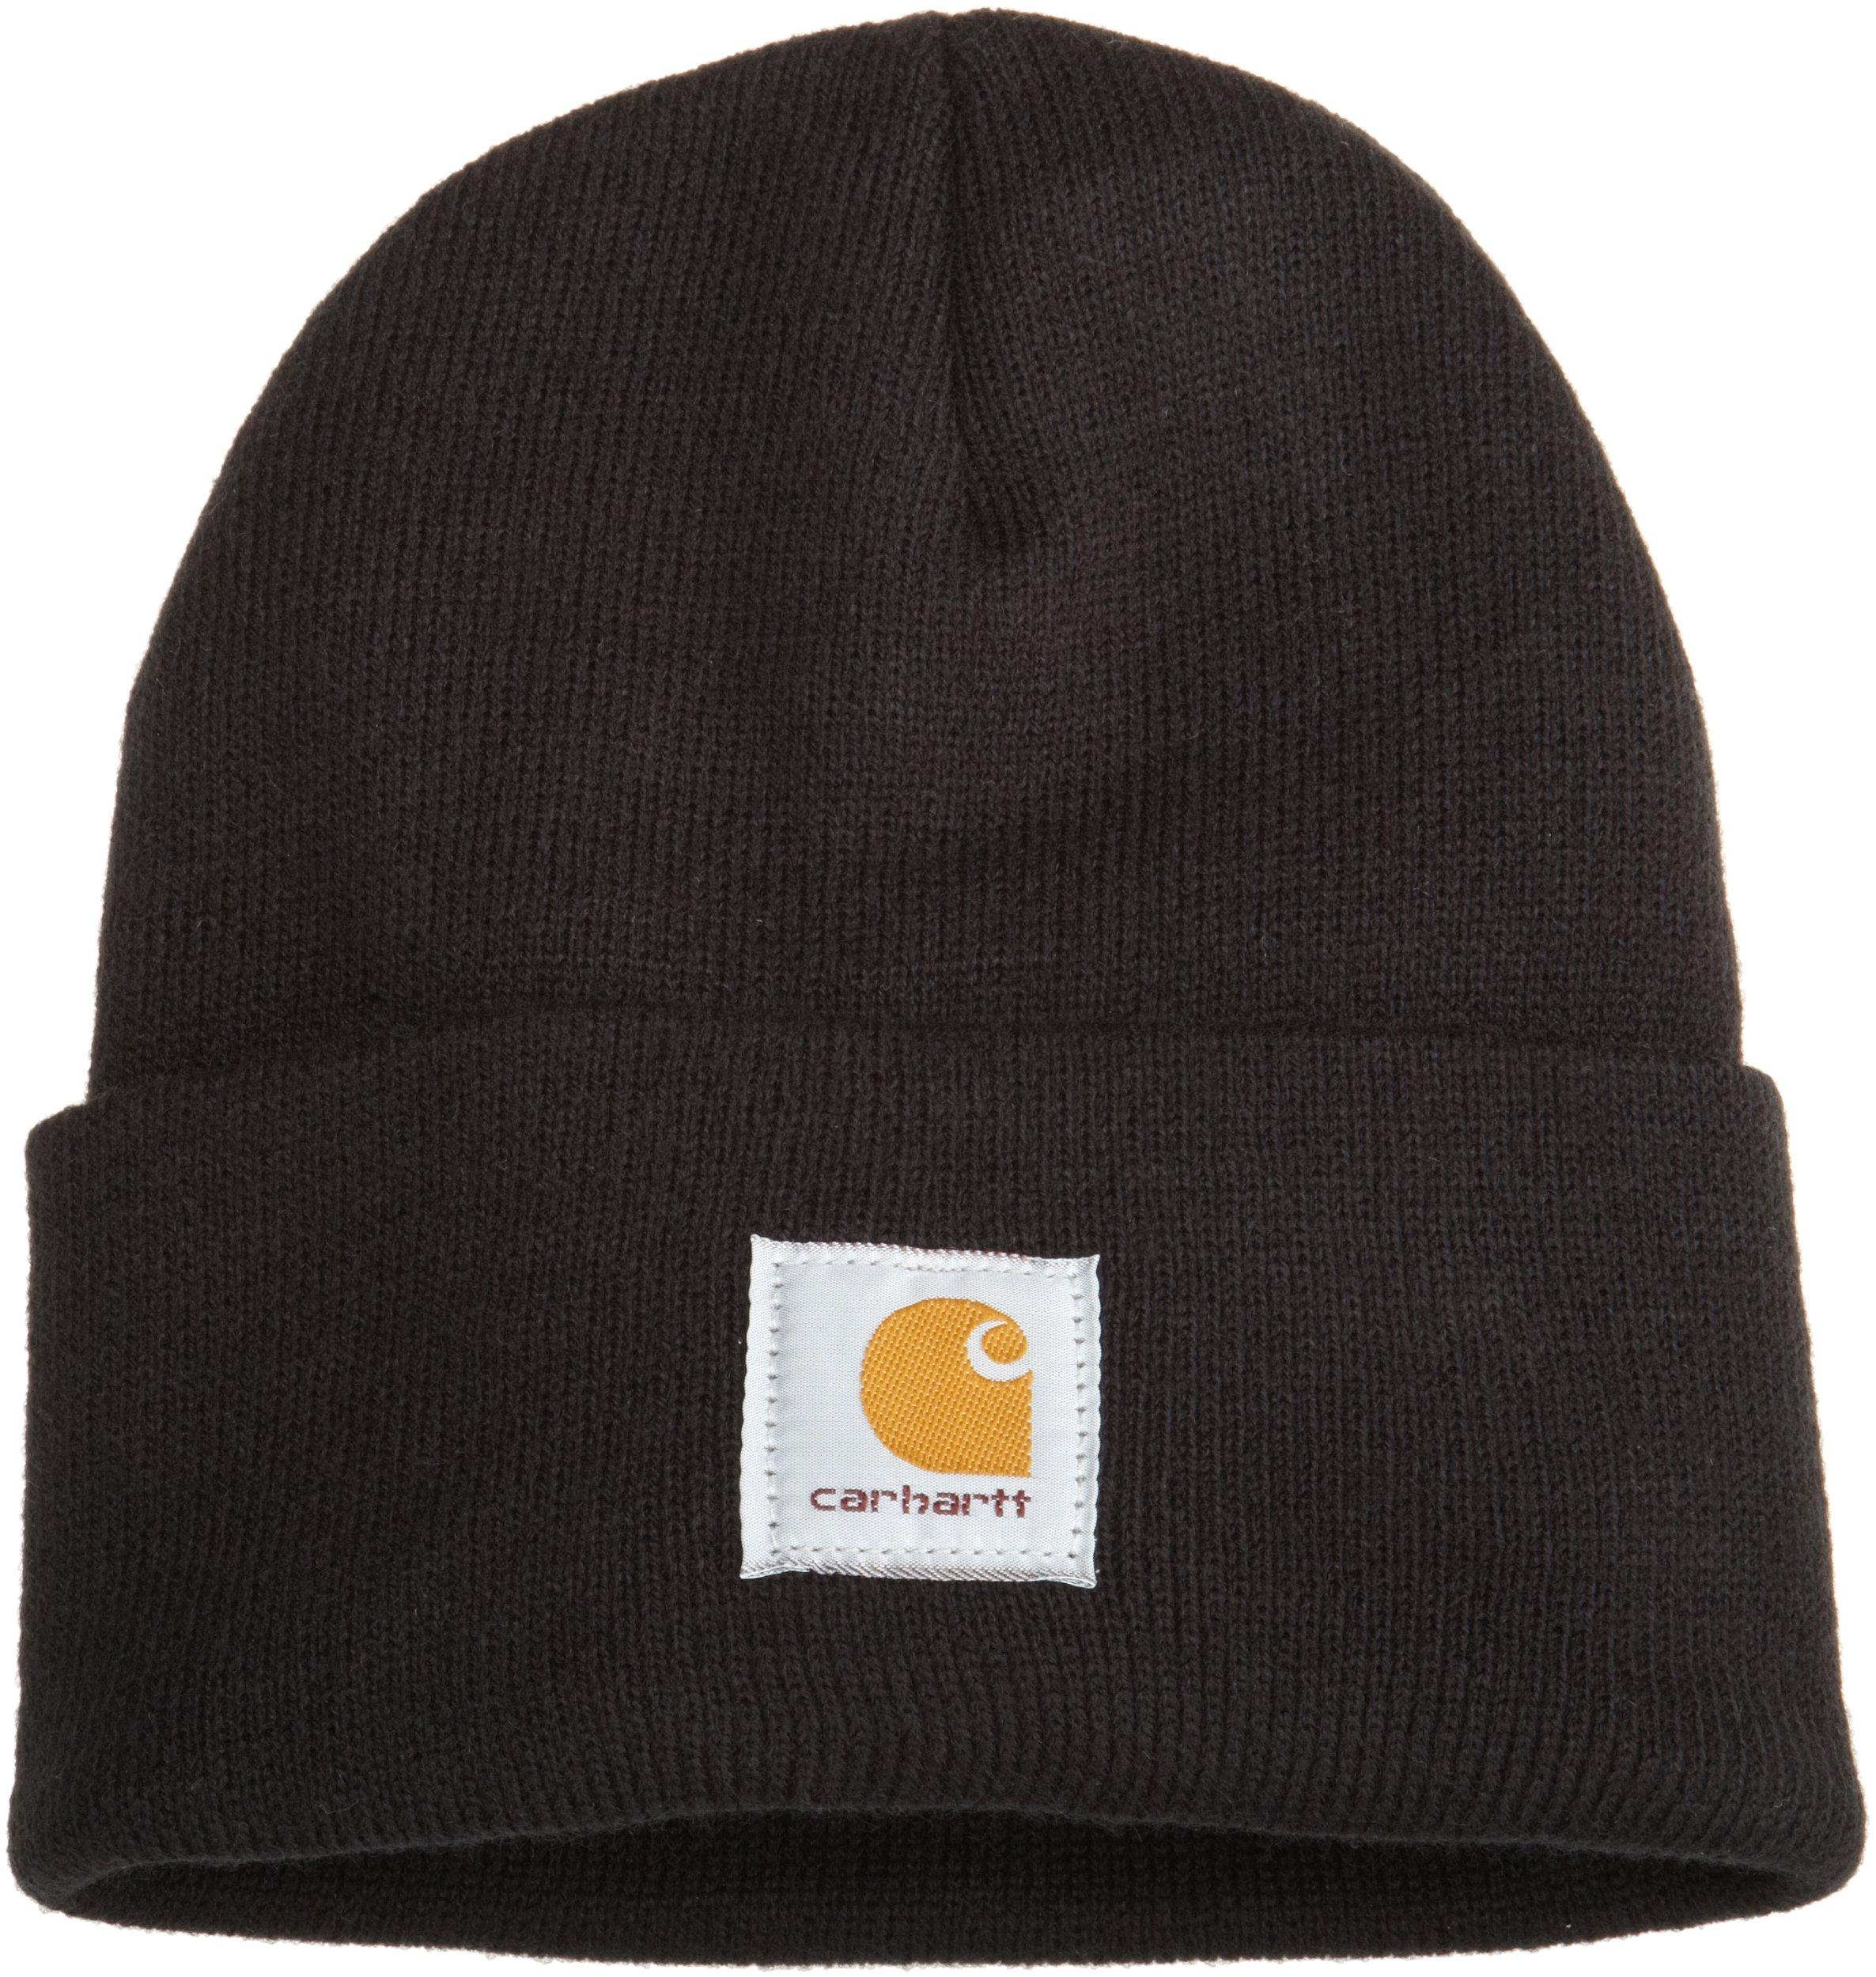 Carhartt Men's Acrylic Watch Hat,Black,One Size